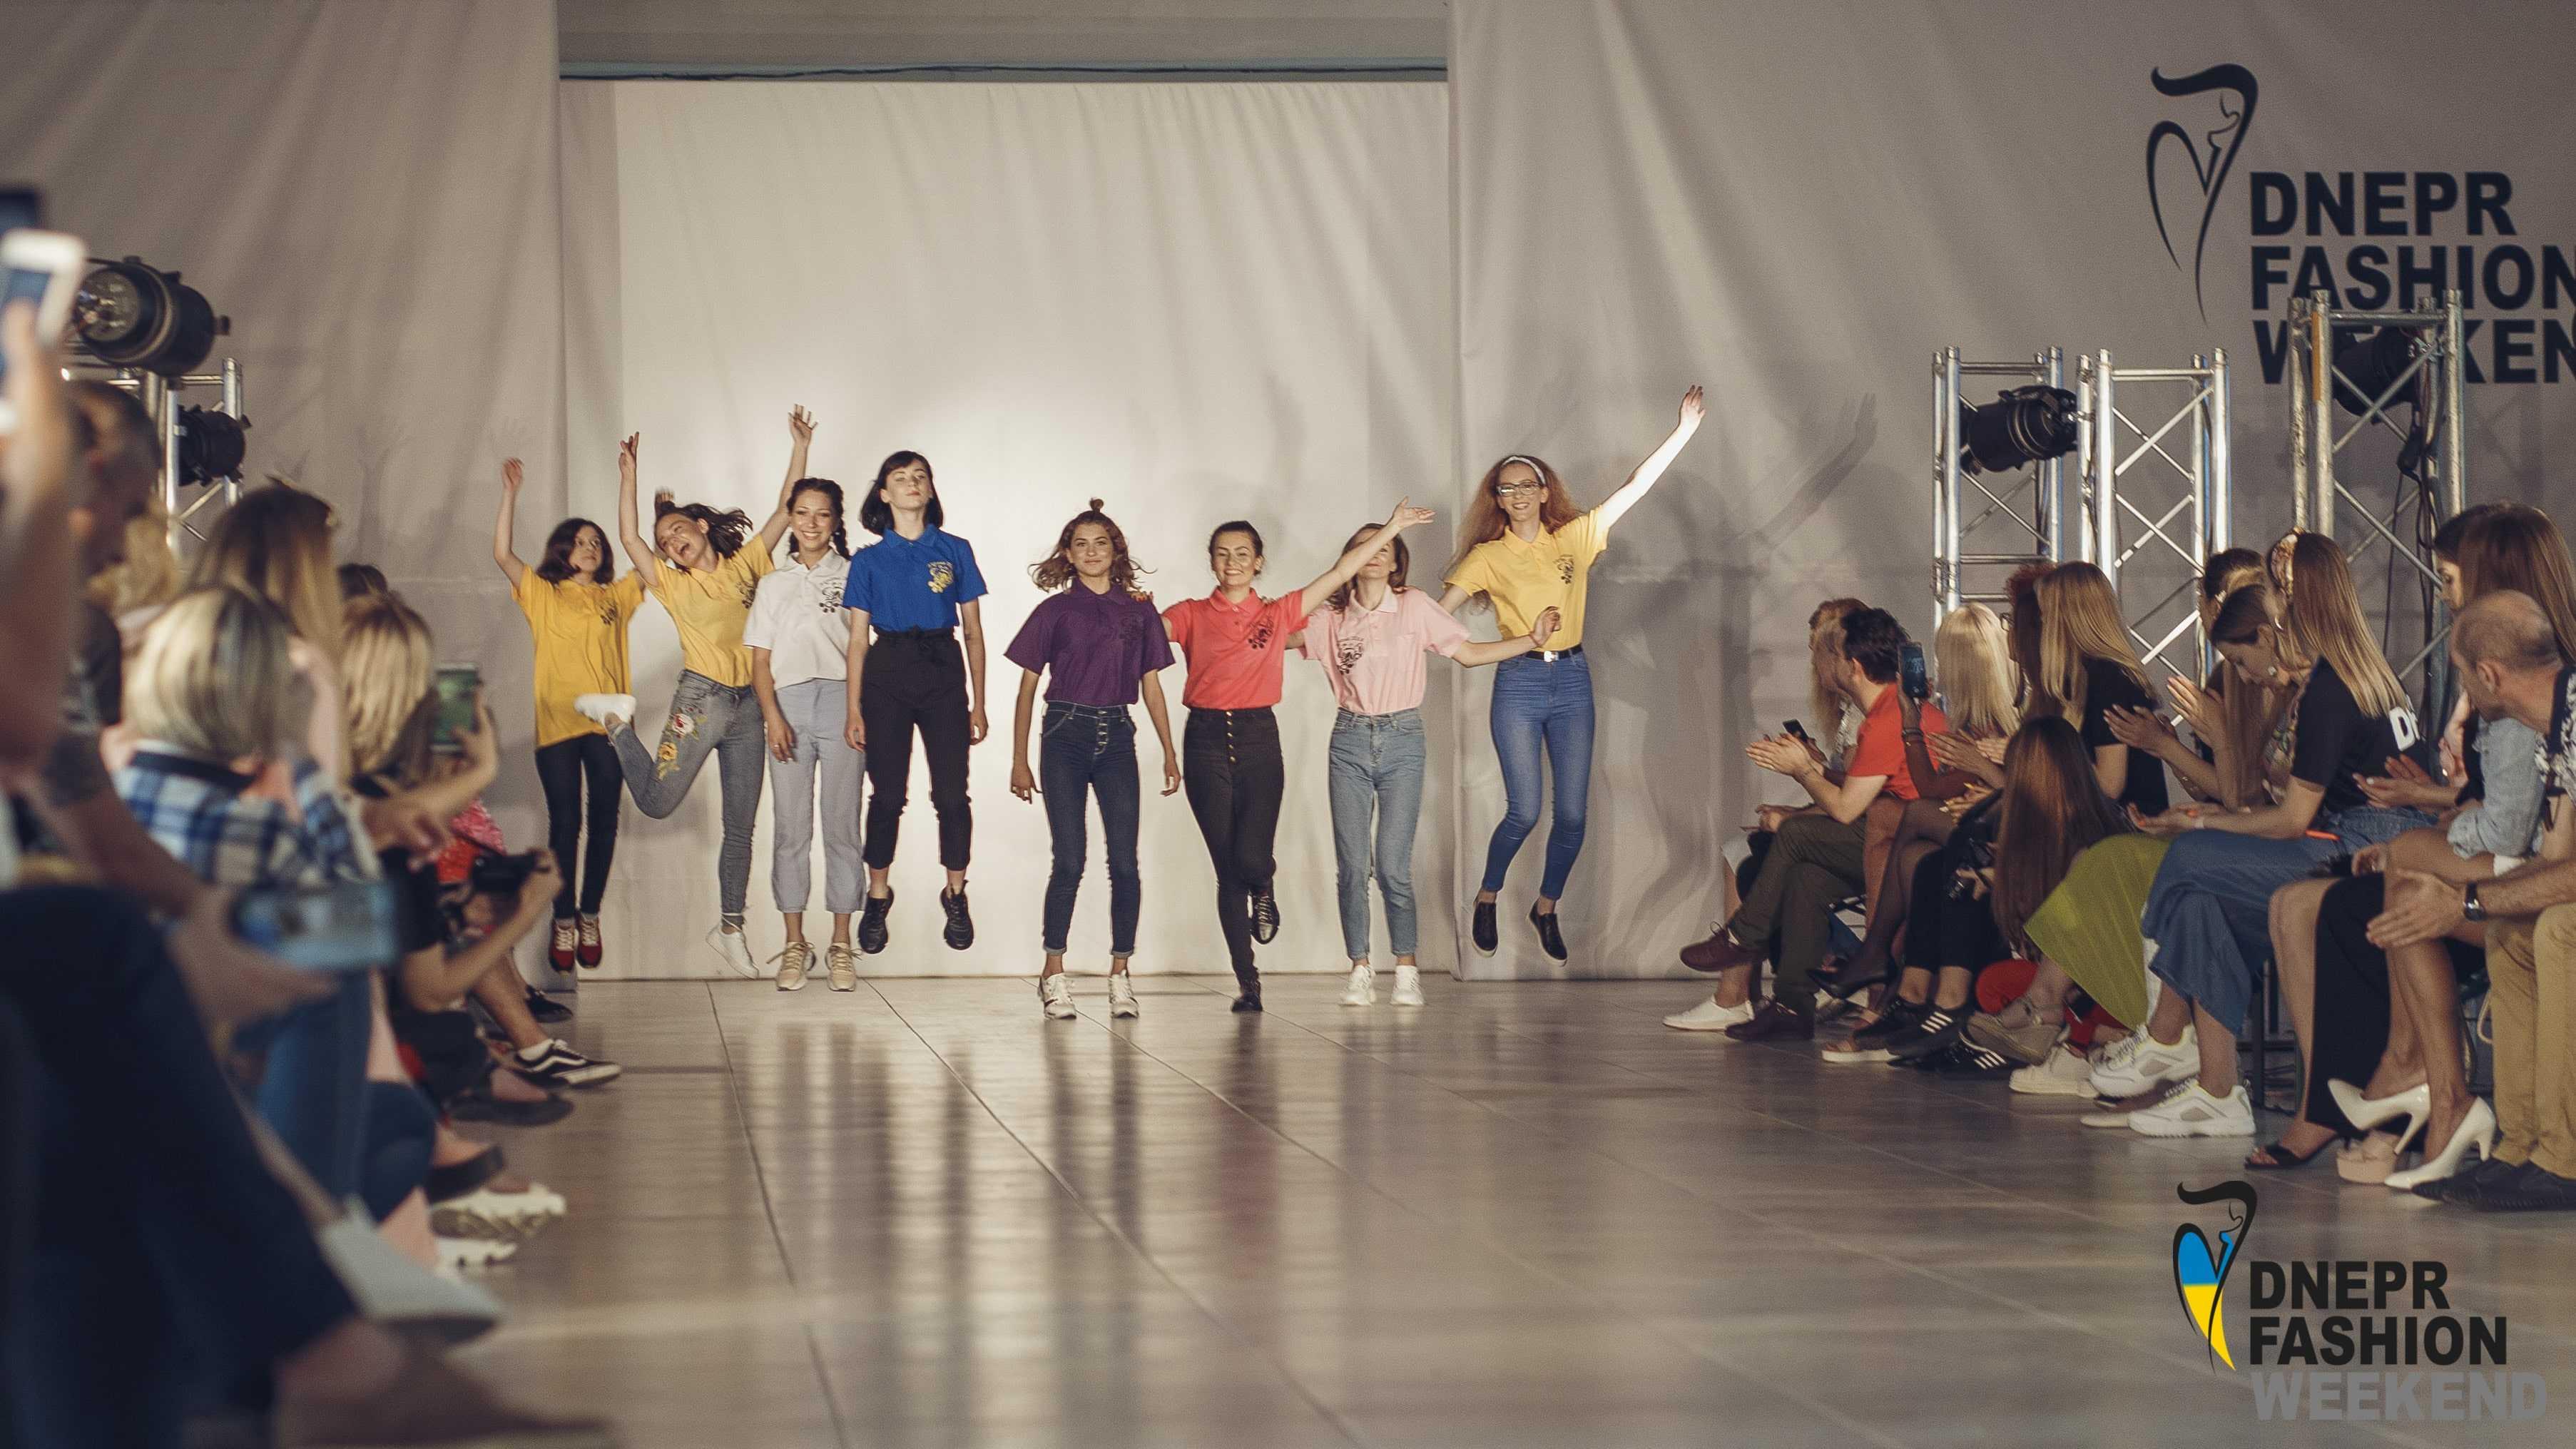 Хроники Dnepr Fashion Weekend как прошли три дня модного мероприятия 1